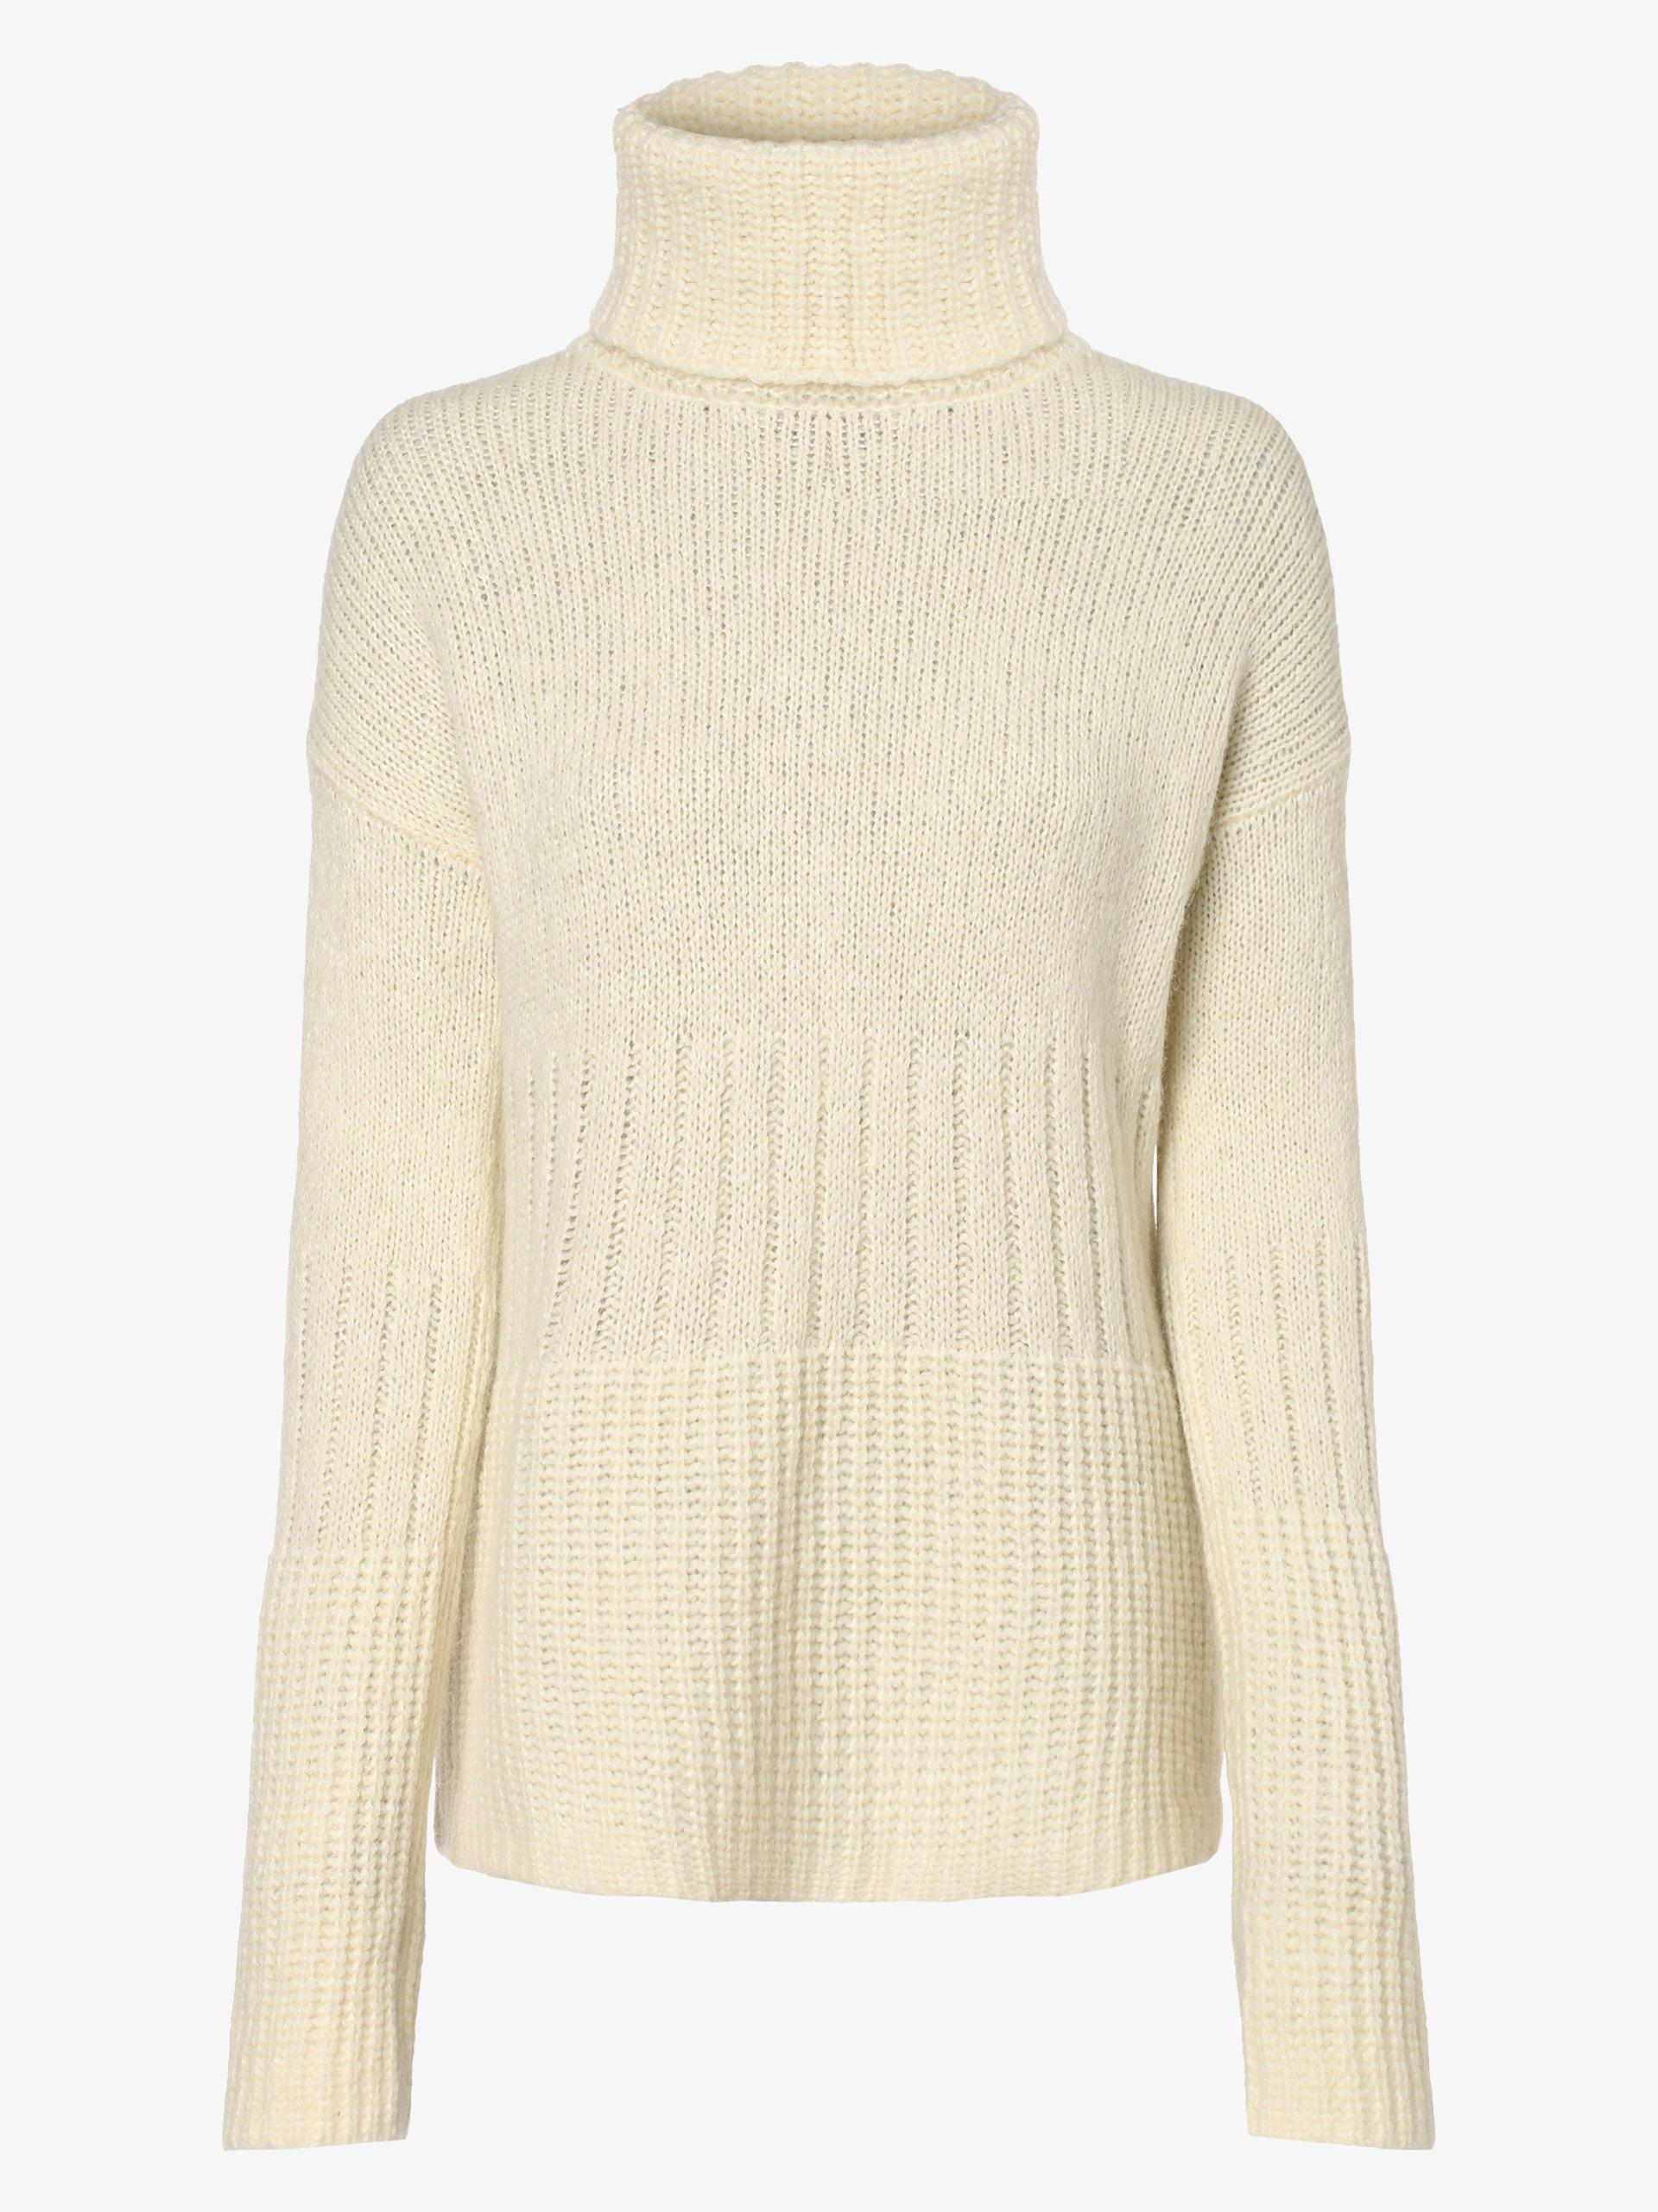 BOSS Casual Damen Pullover mit Alpaka-Anteil - Wuttema